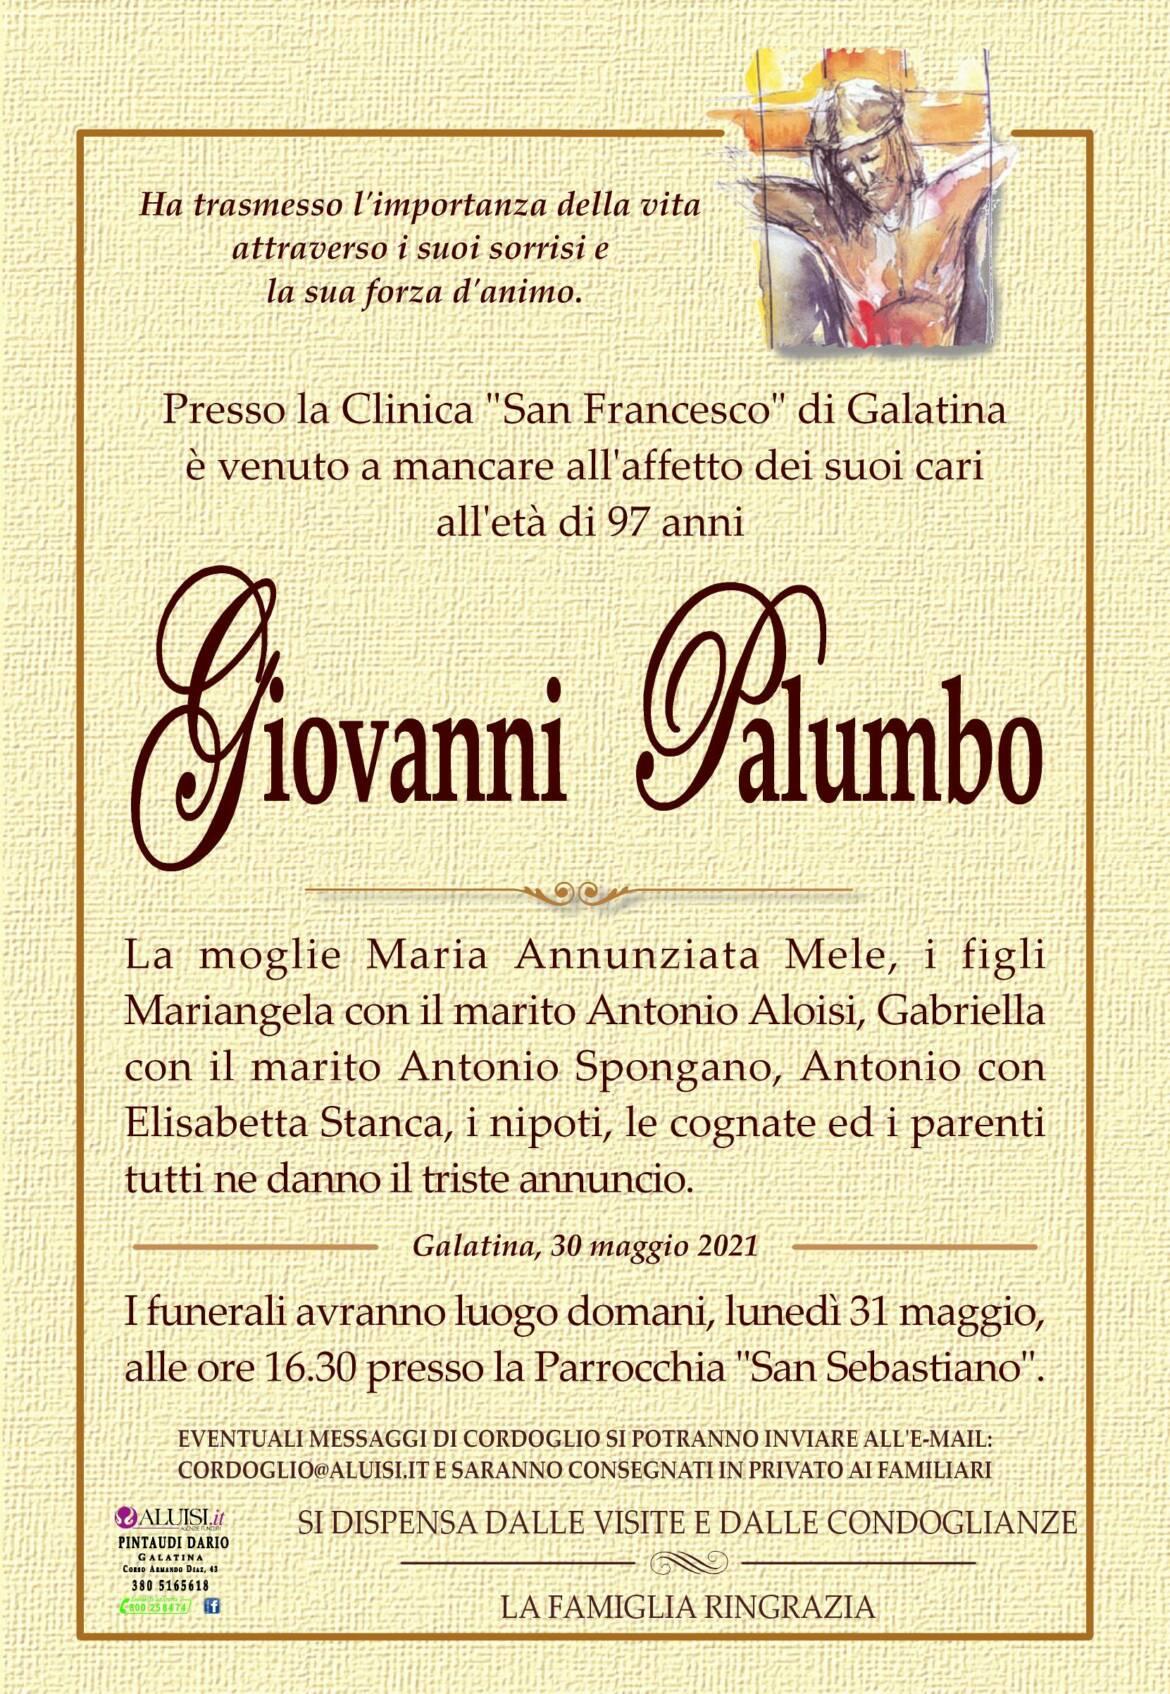 Annuncio-GIOVANNI-PALUMBO-GALATINA.jpg